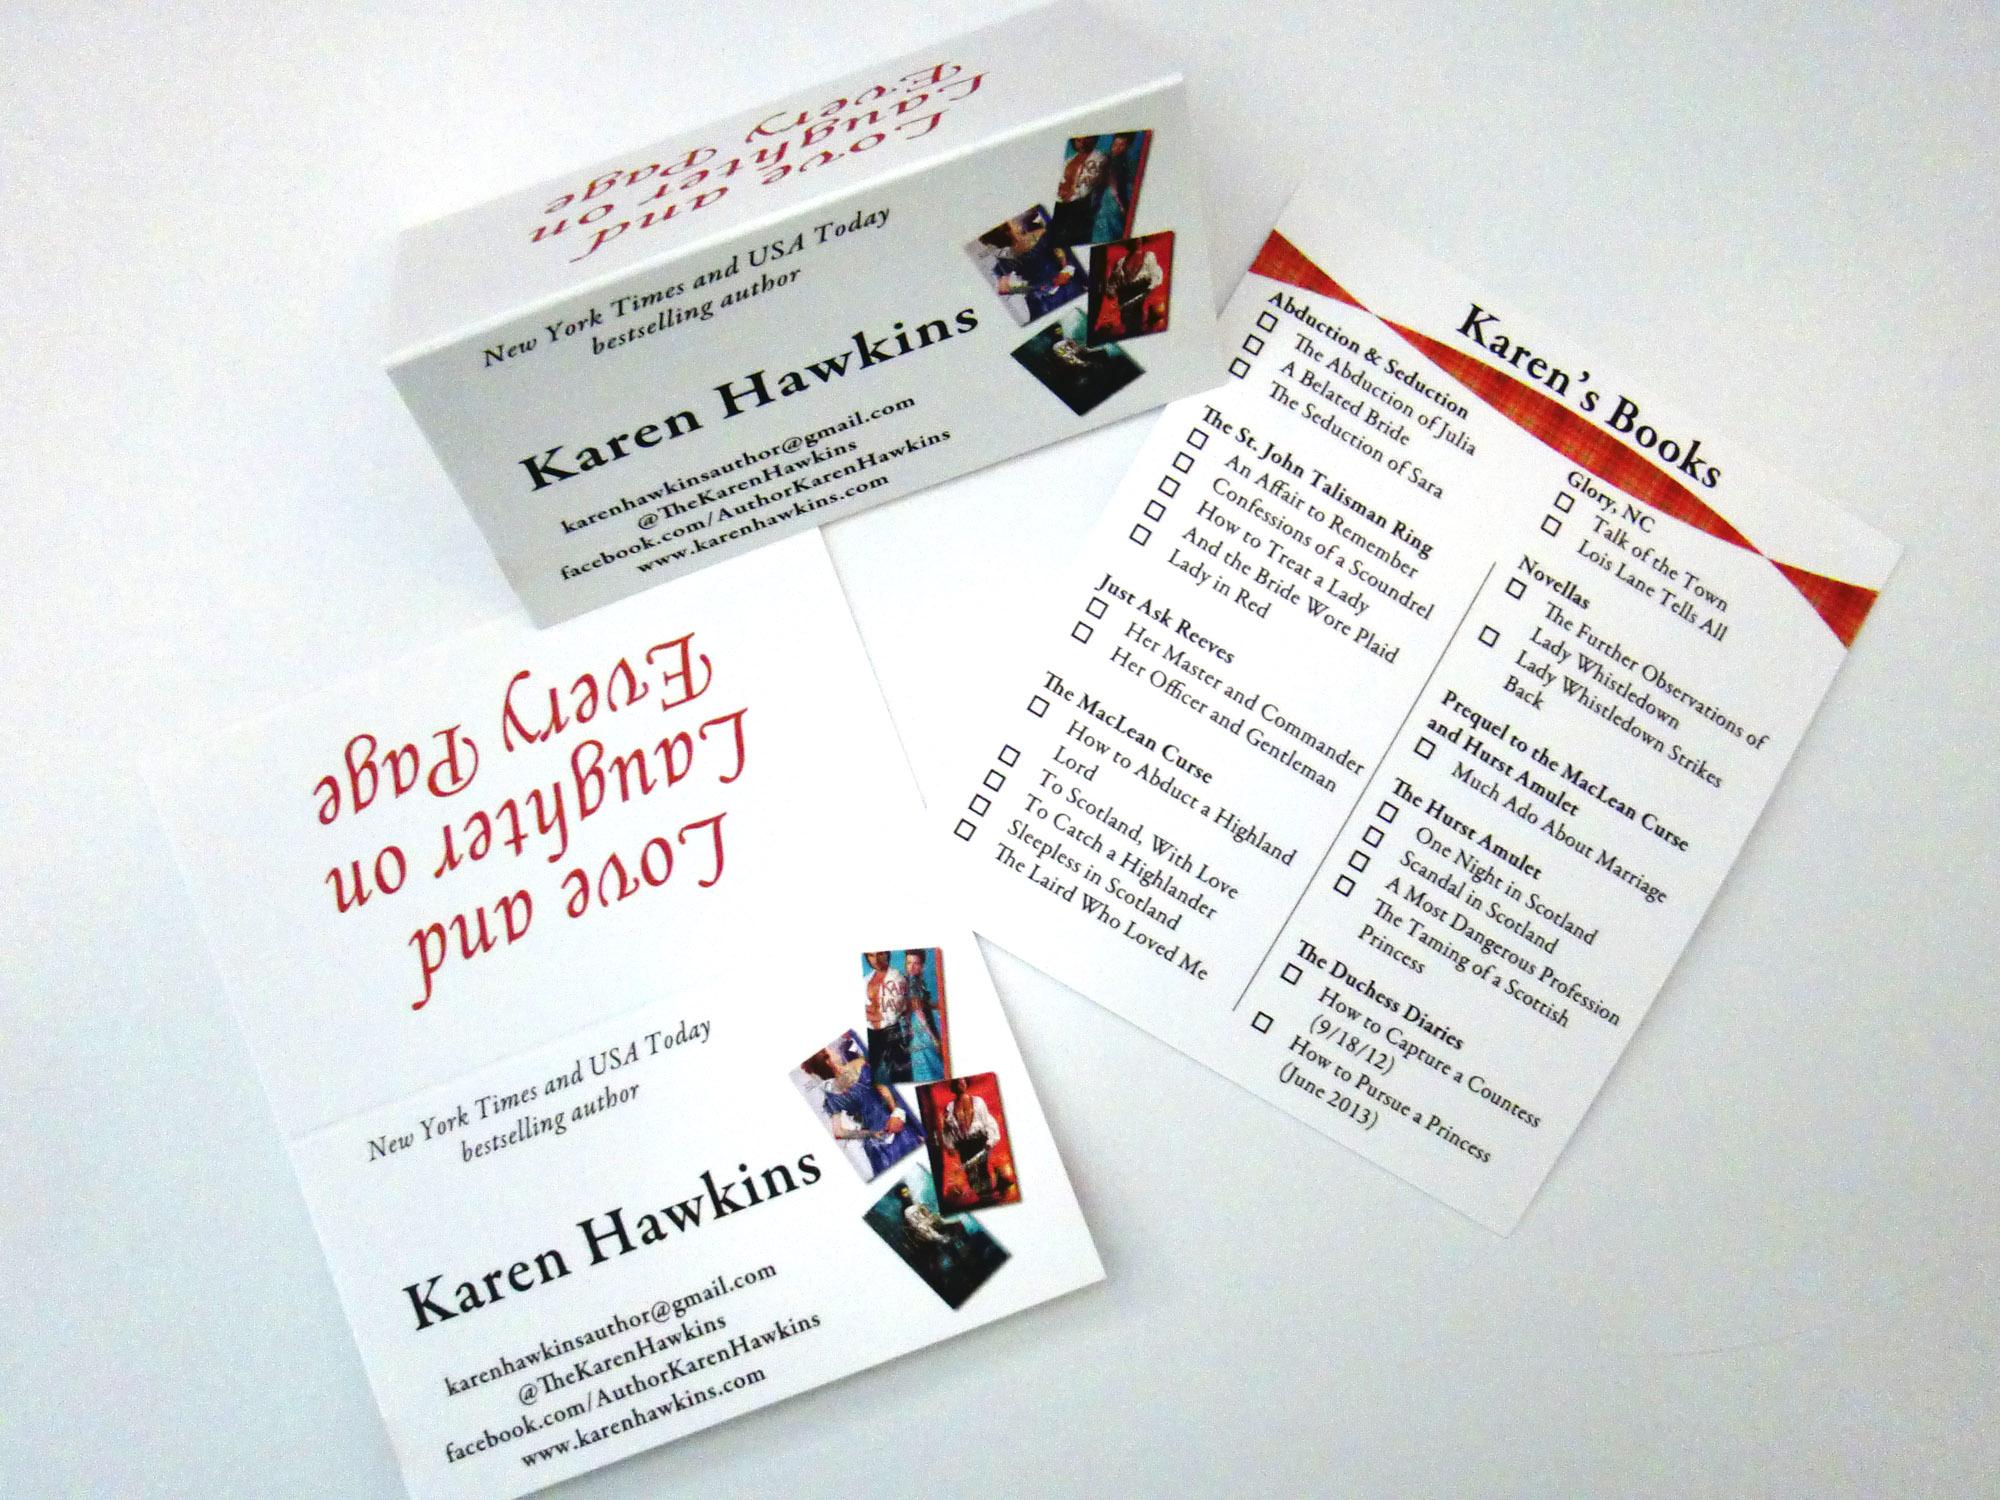 Karen Hawkins card